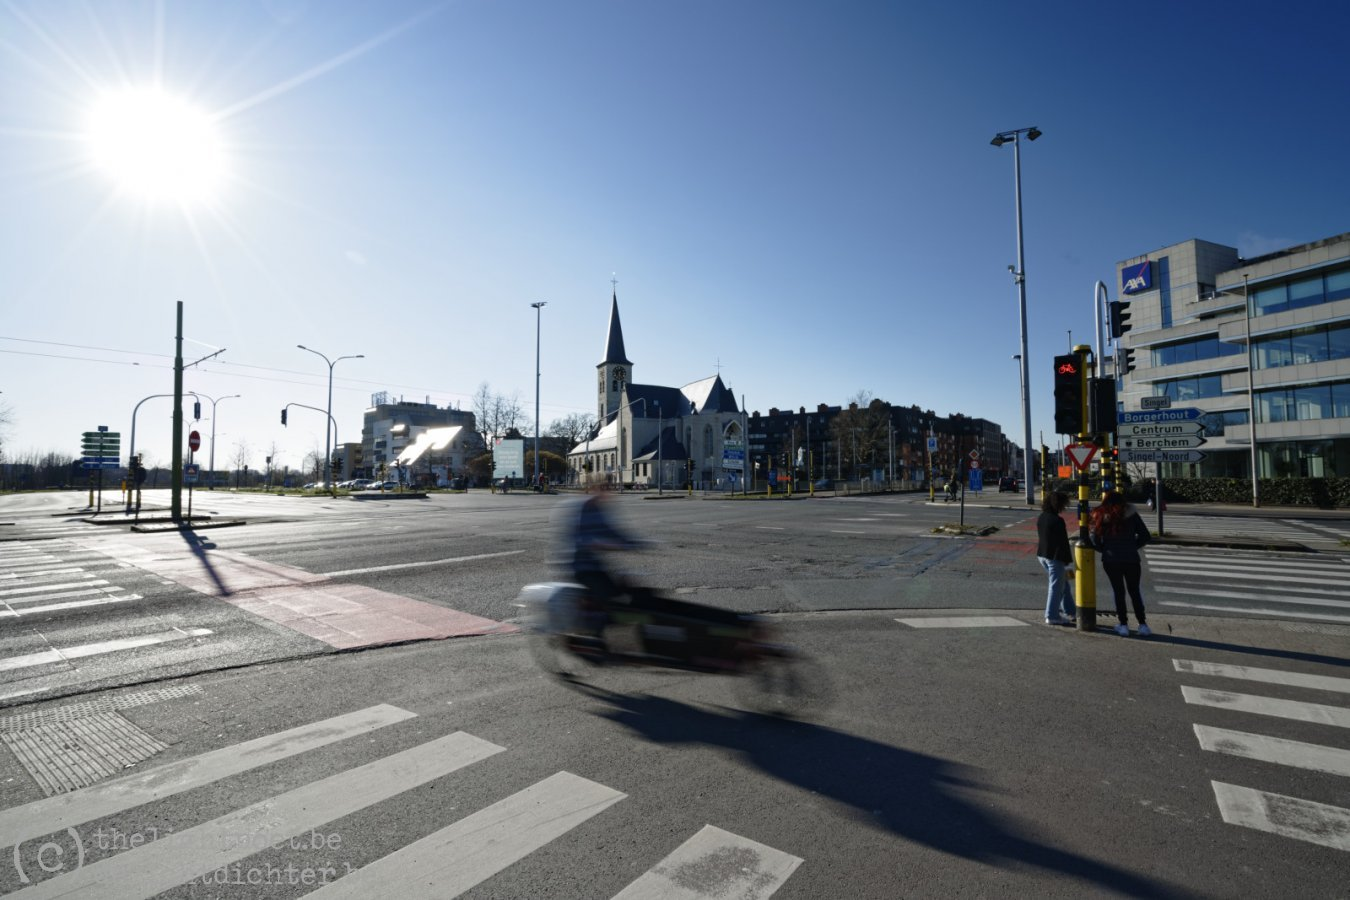 2020_03_Antwerpen_20200331_173029_DxO_PL3_1600px